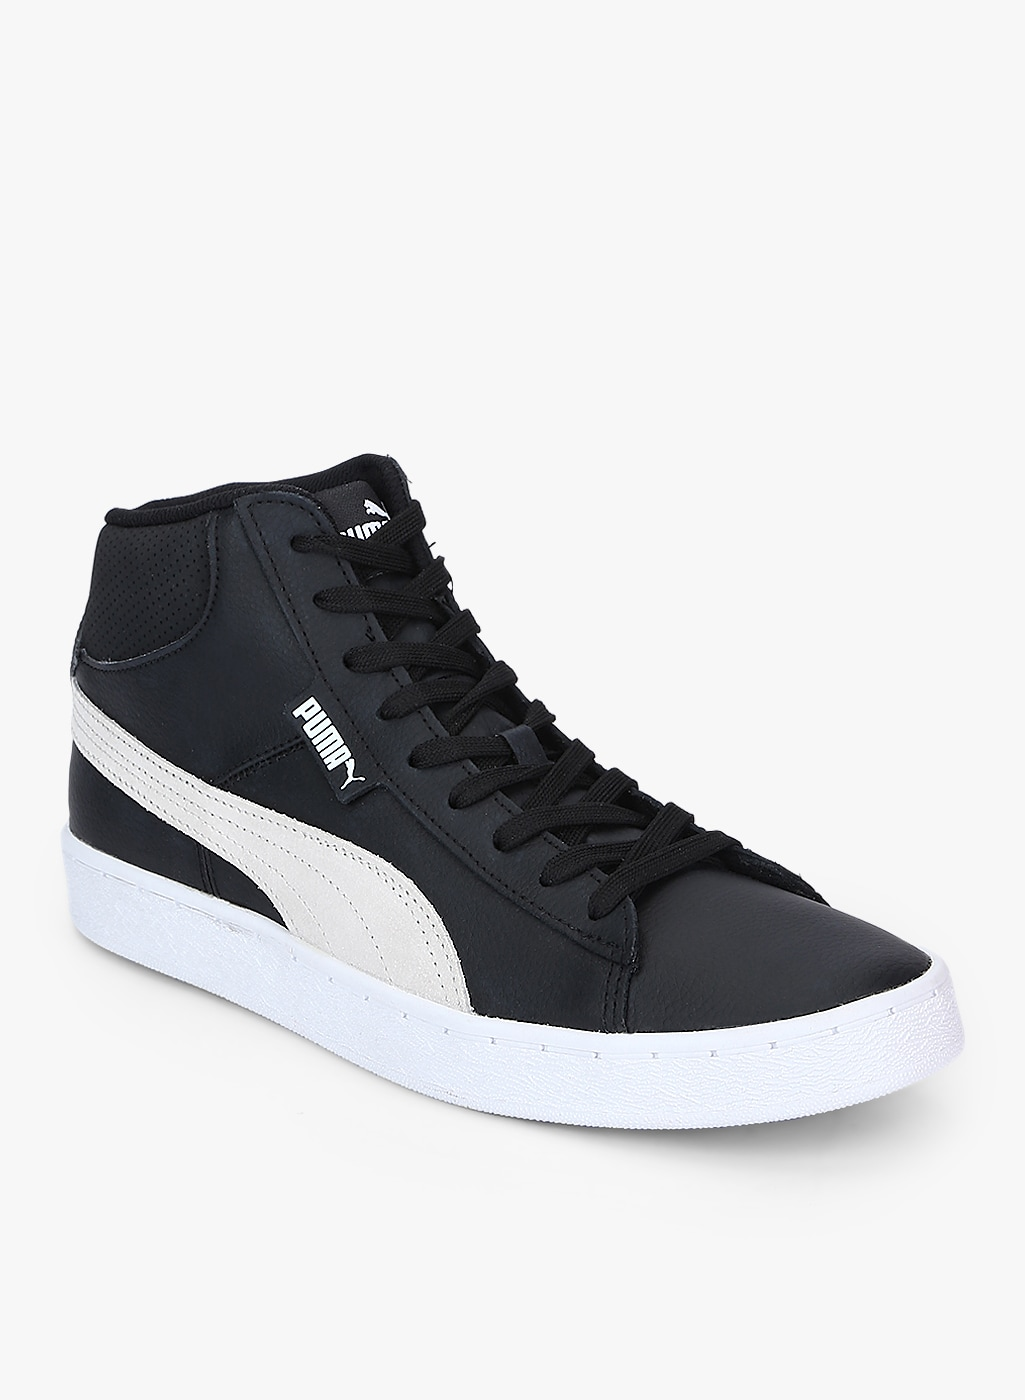 b6f5d04da18 Black Sandals Casual Shoes - Buy Black Sandals Casual Shoes online in India